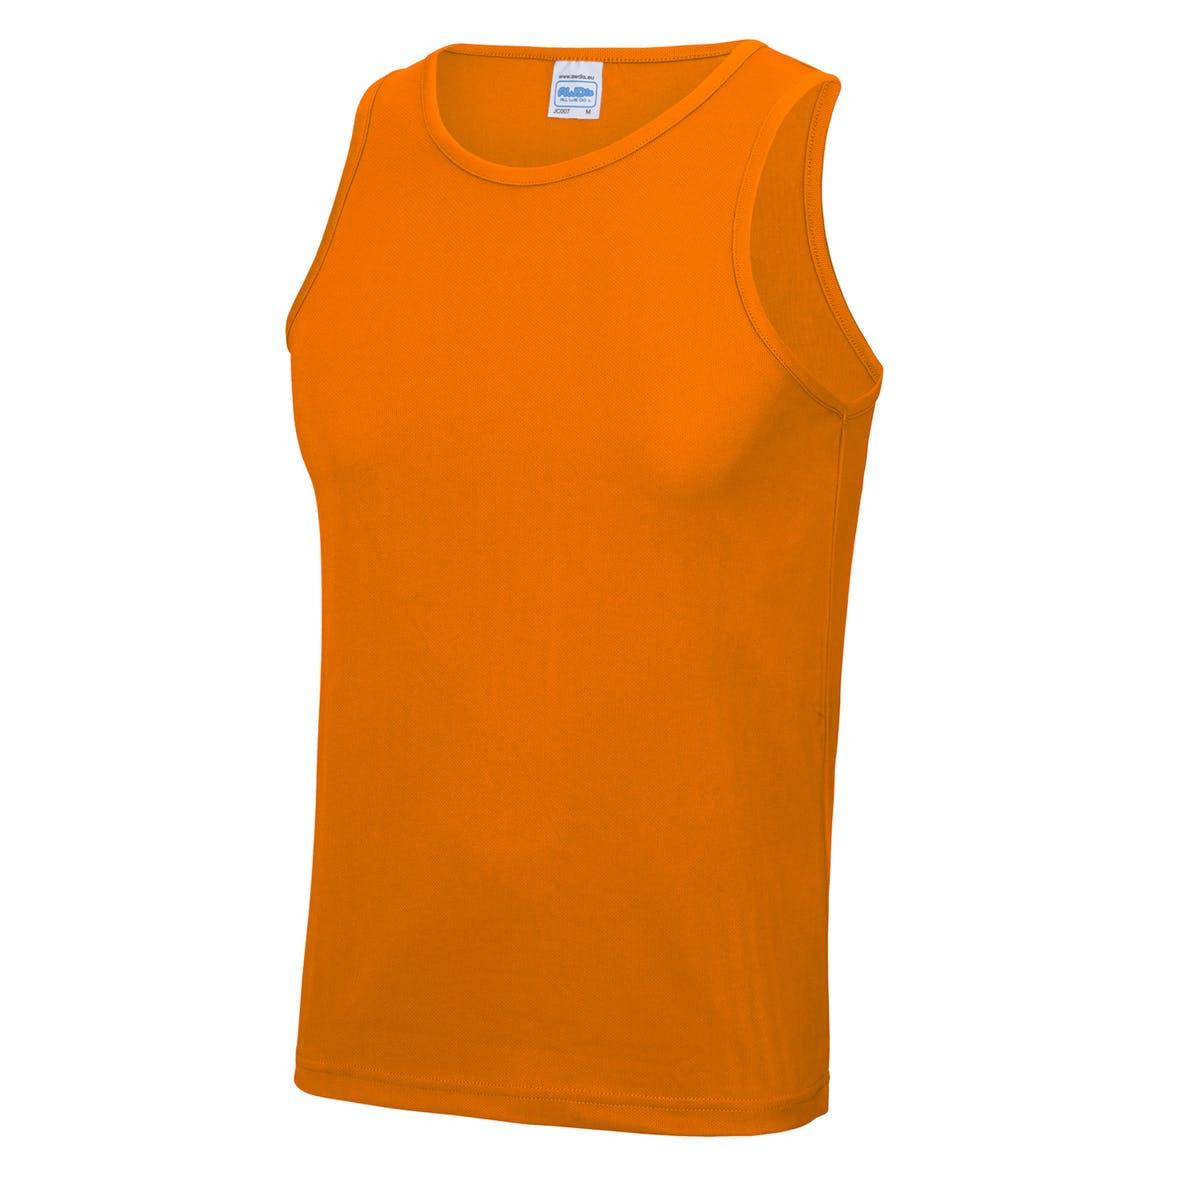 orange crush sports vest